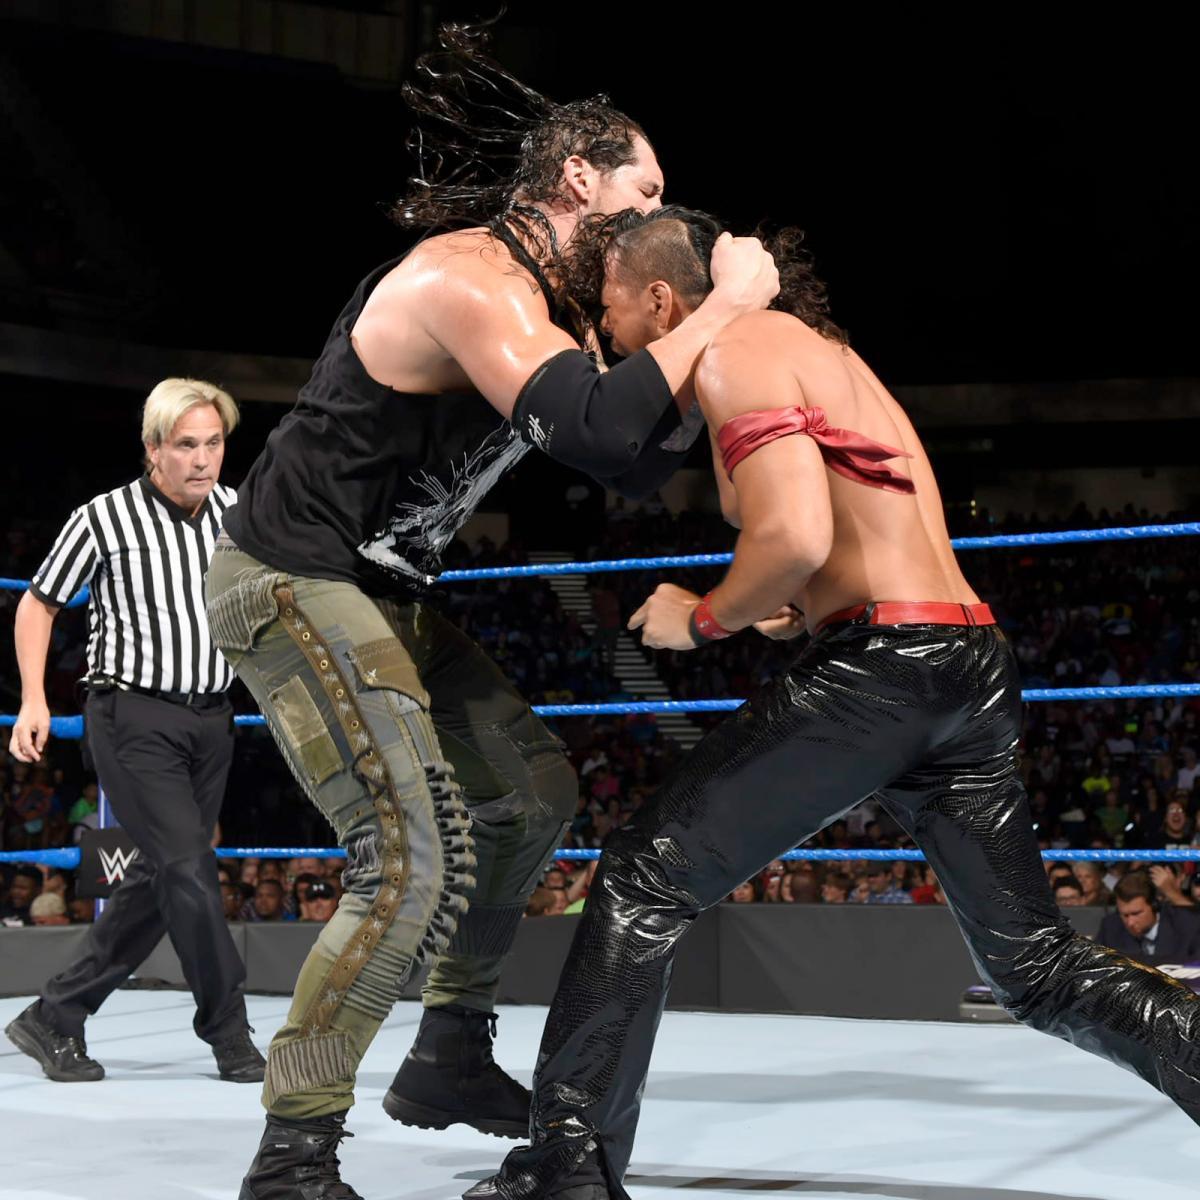 【WWE】中邑&スタイルズ組がPPV前哨戦で敗北